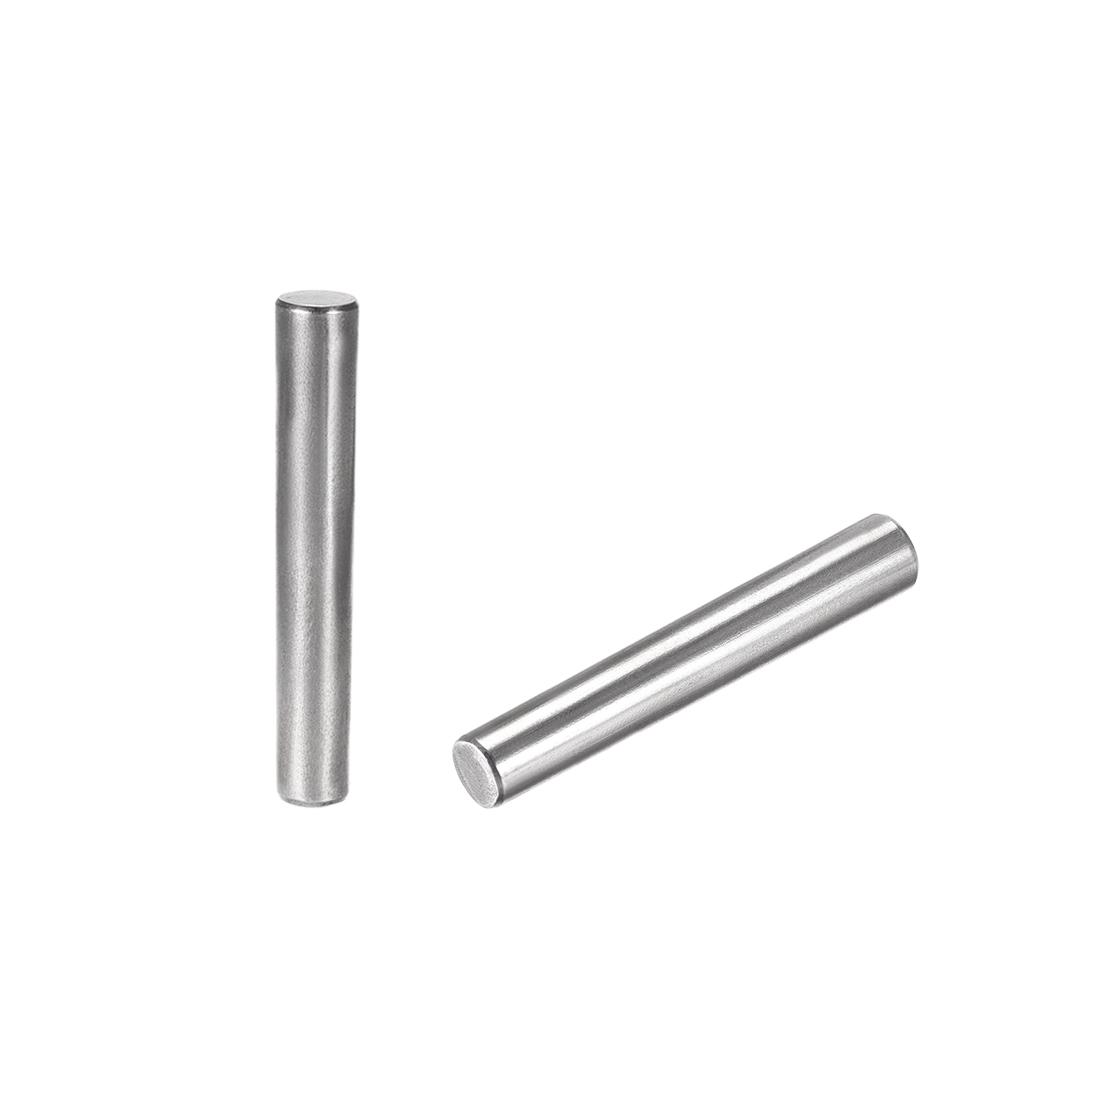 Carbon Steel GB117 70mm Length 10mm x 11.4mm Small End Diameter 1:50 2 Pcs